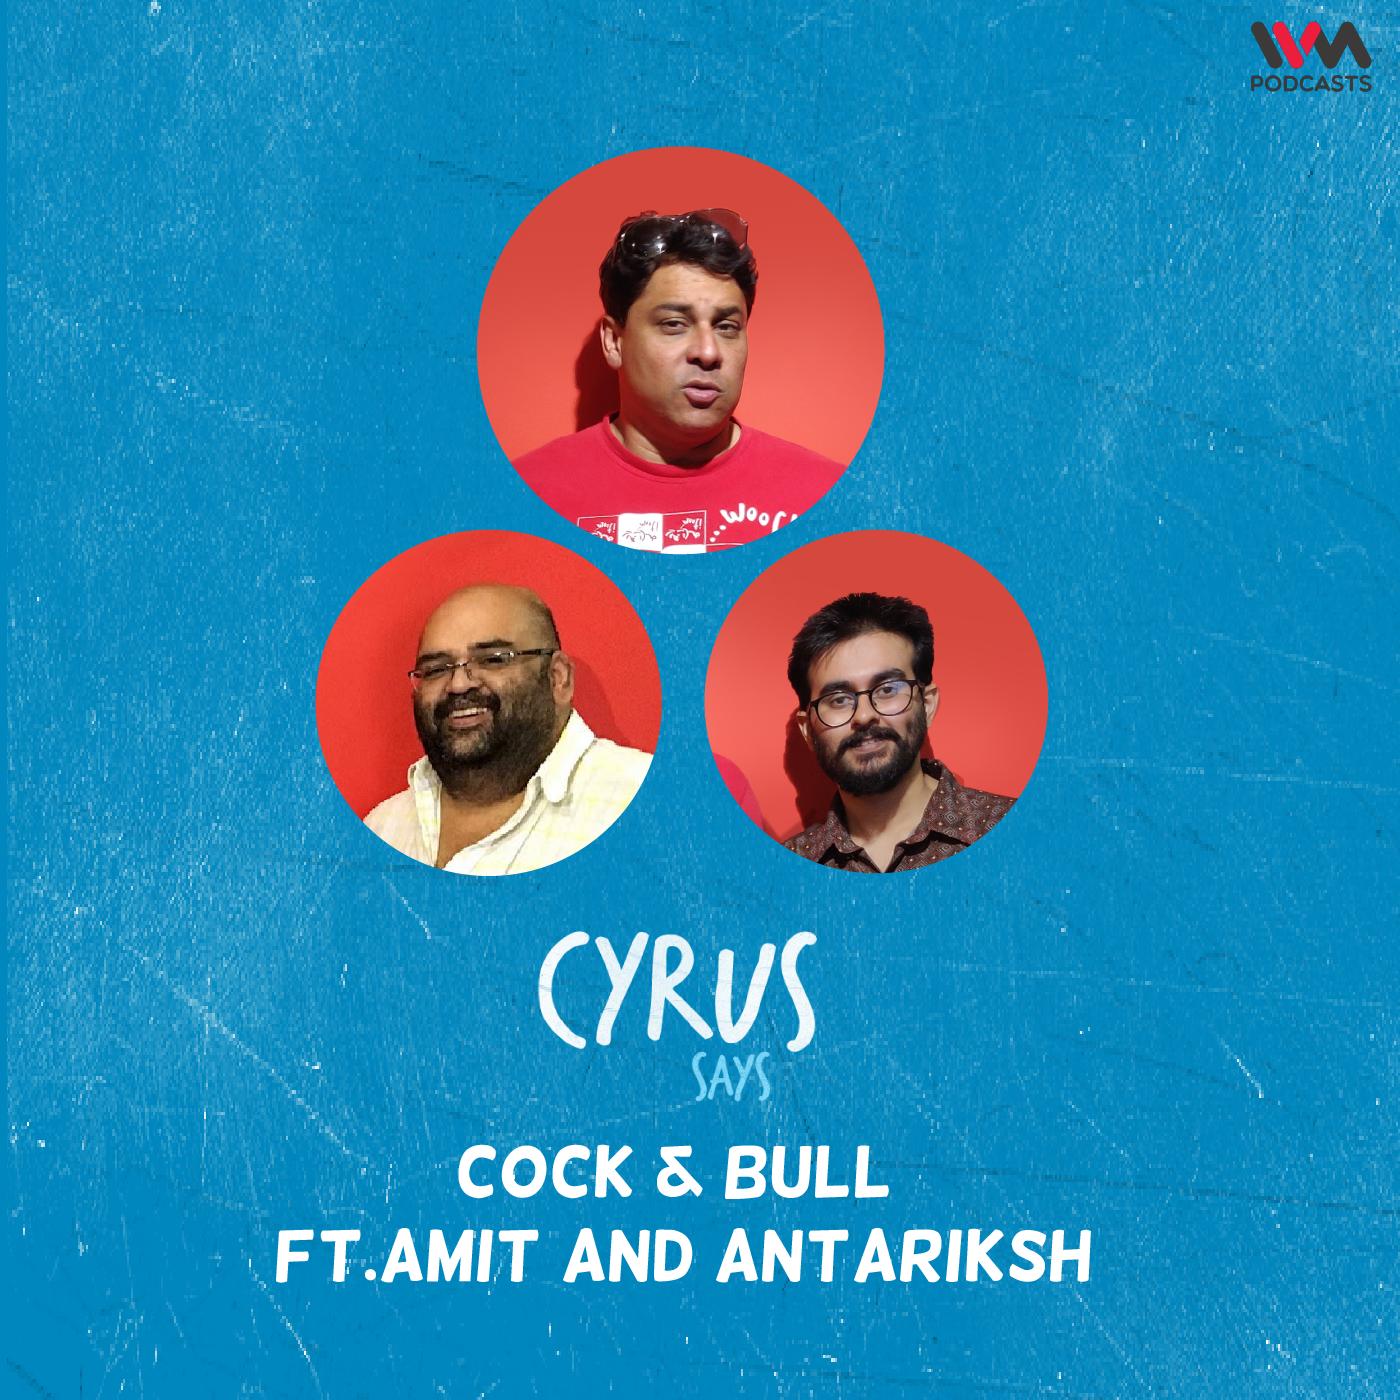 Ep. 681: Cock & Bull feat. Amit and Antariksh